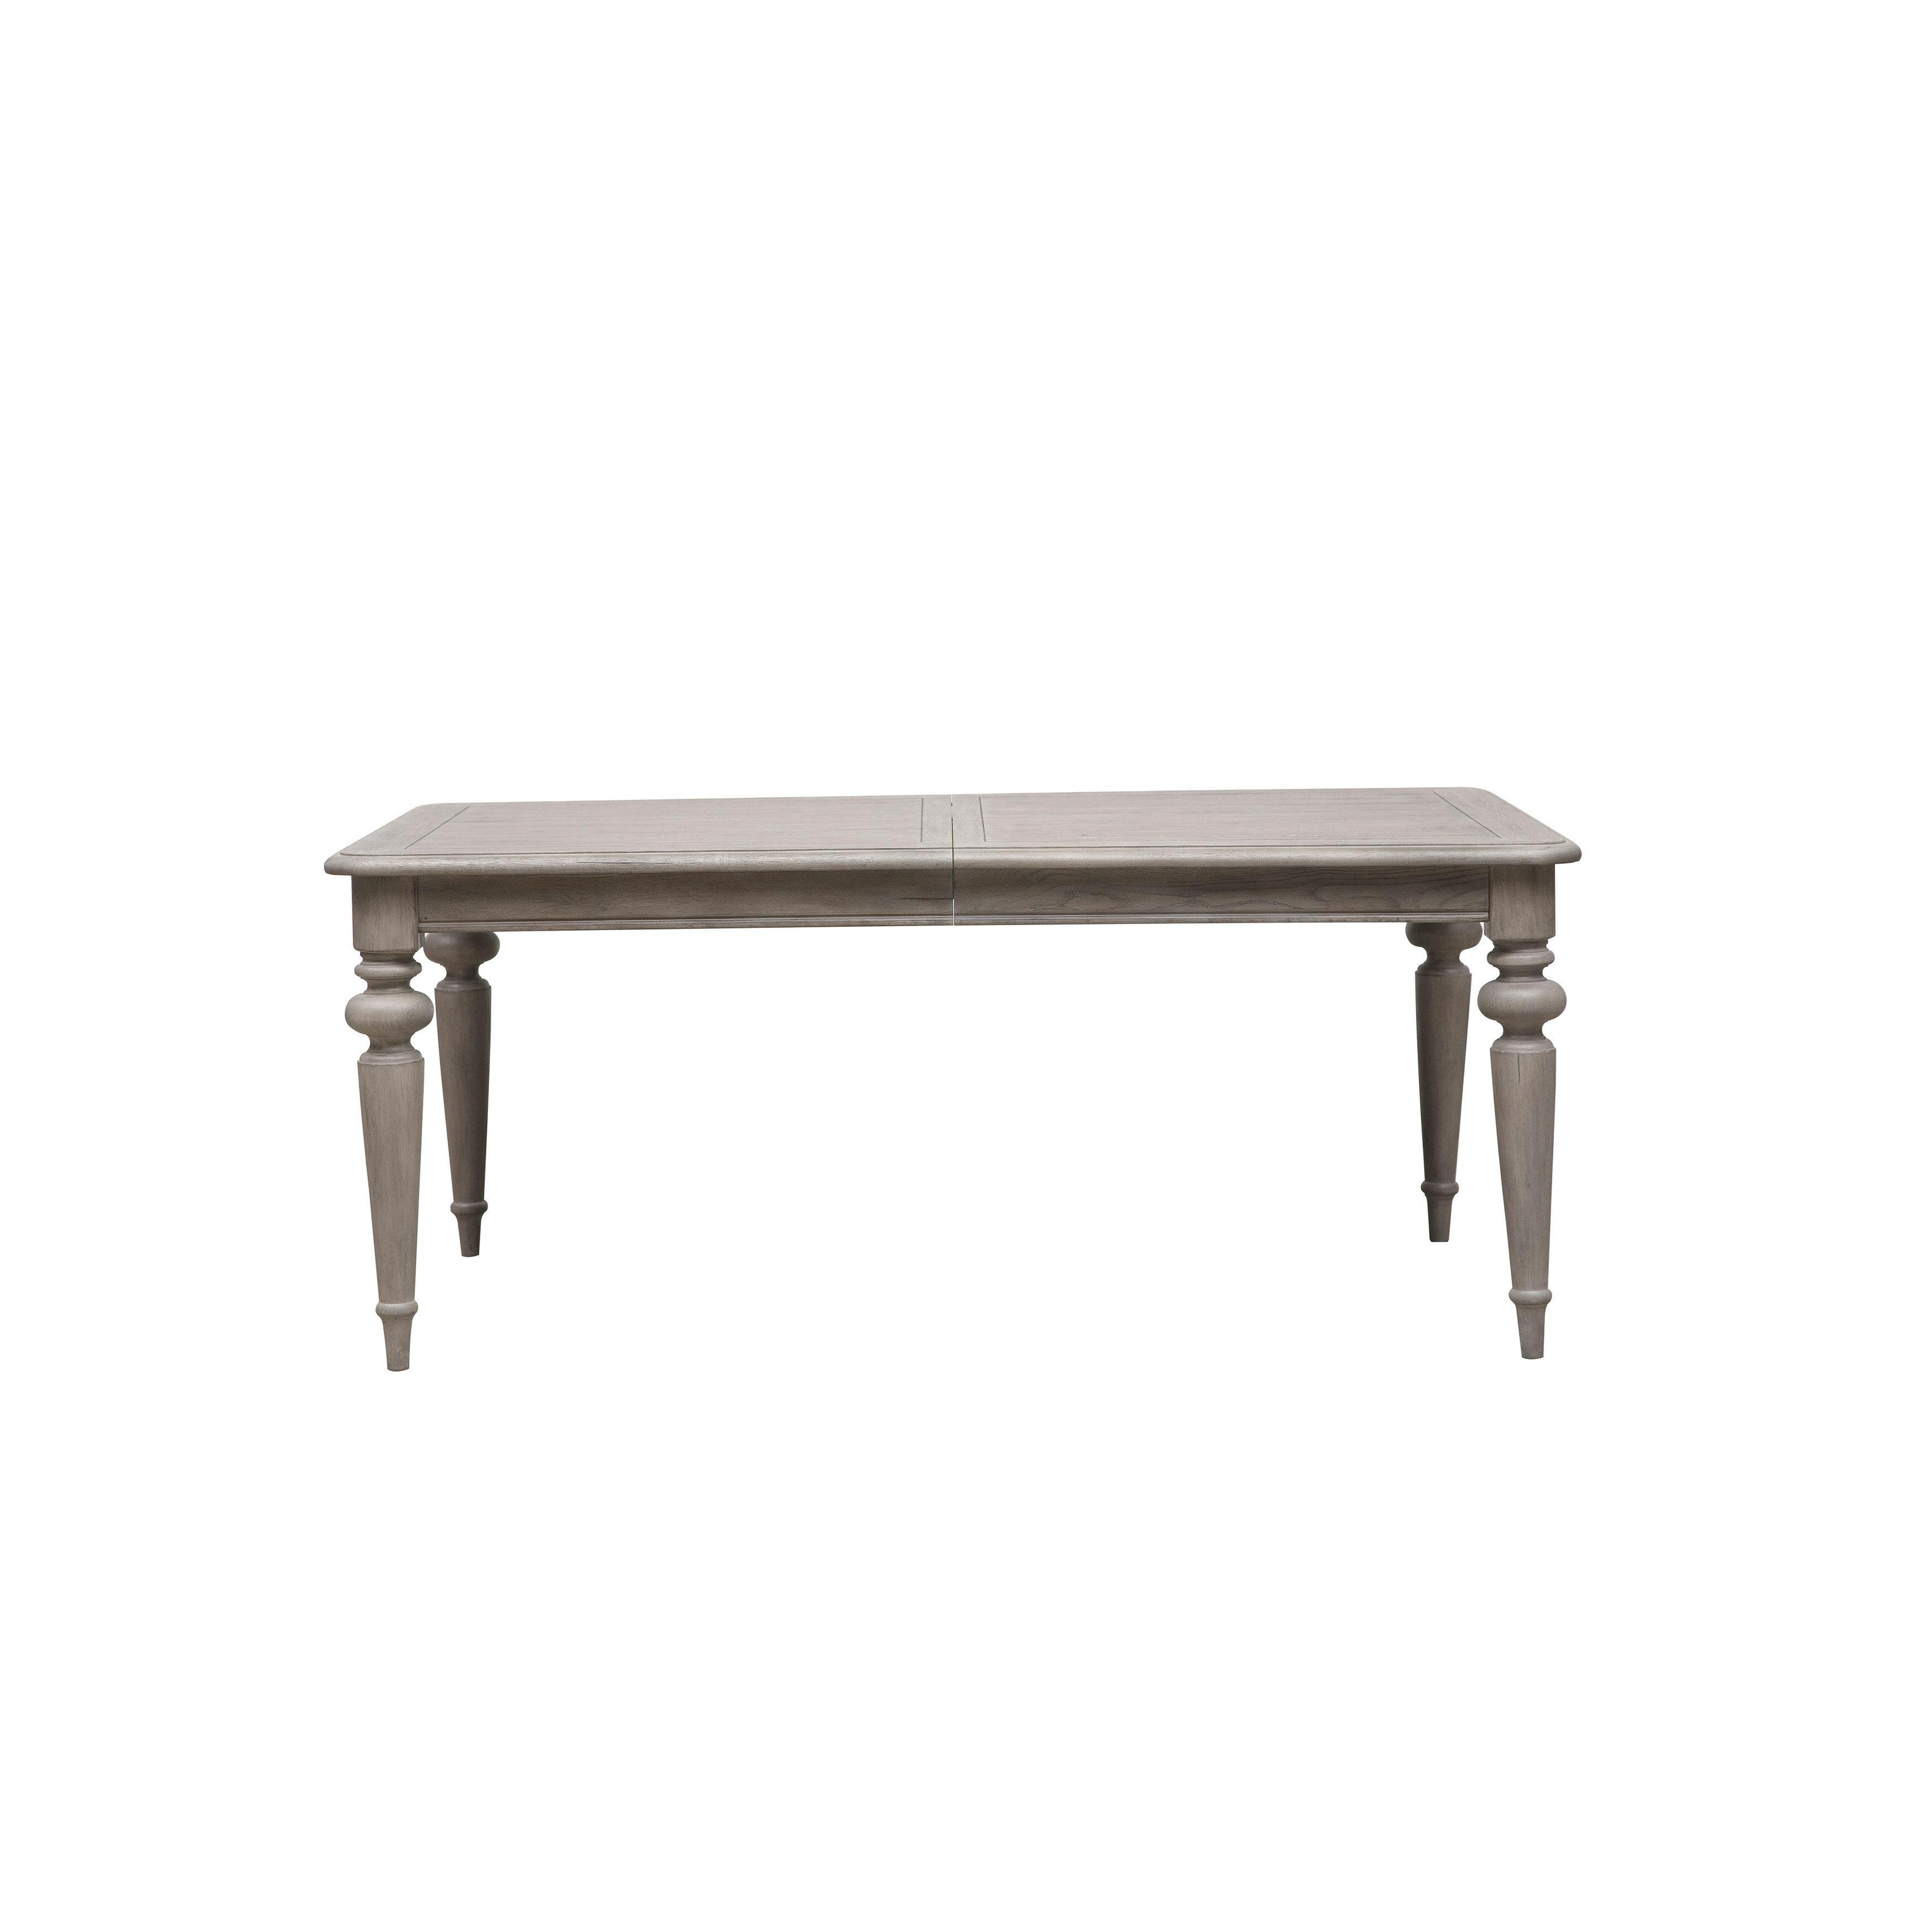 Superb Artrip Extendable Dining Table Interior Design Ideas Gentotryabchikinfo